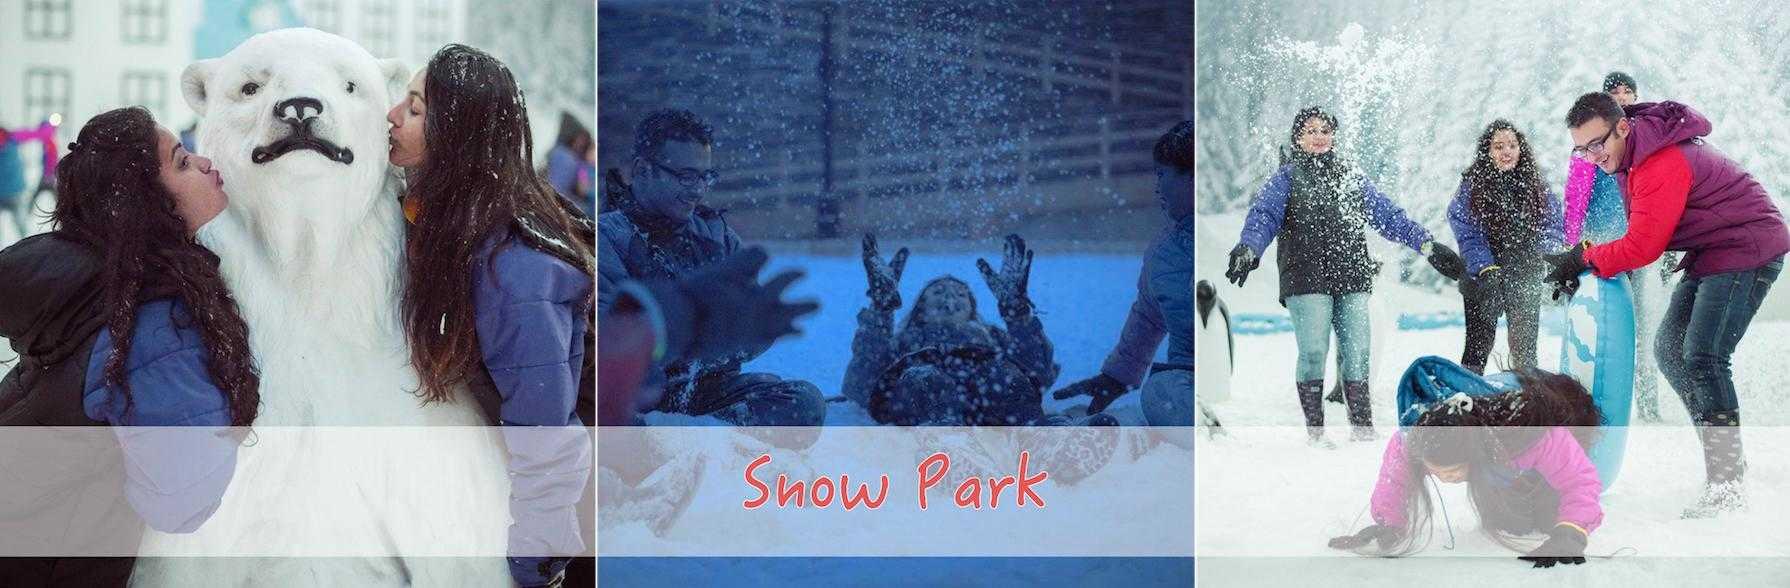 imagica-snow-park.jpg